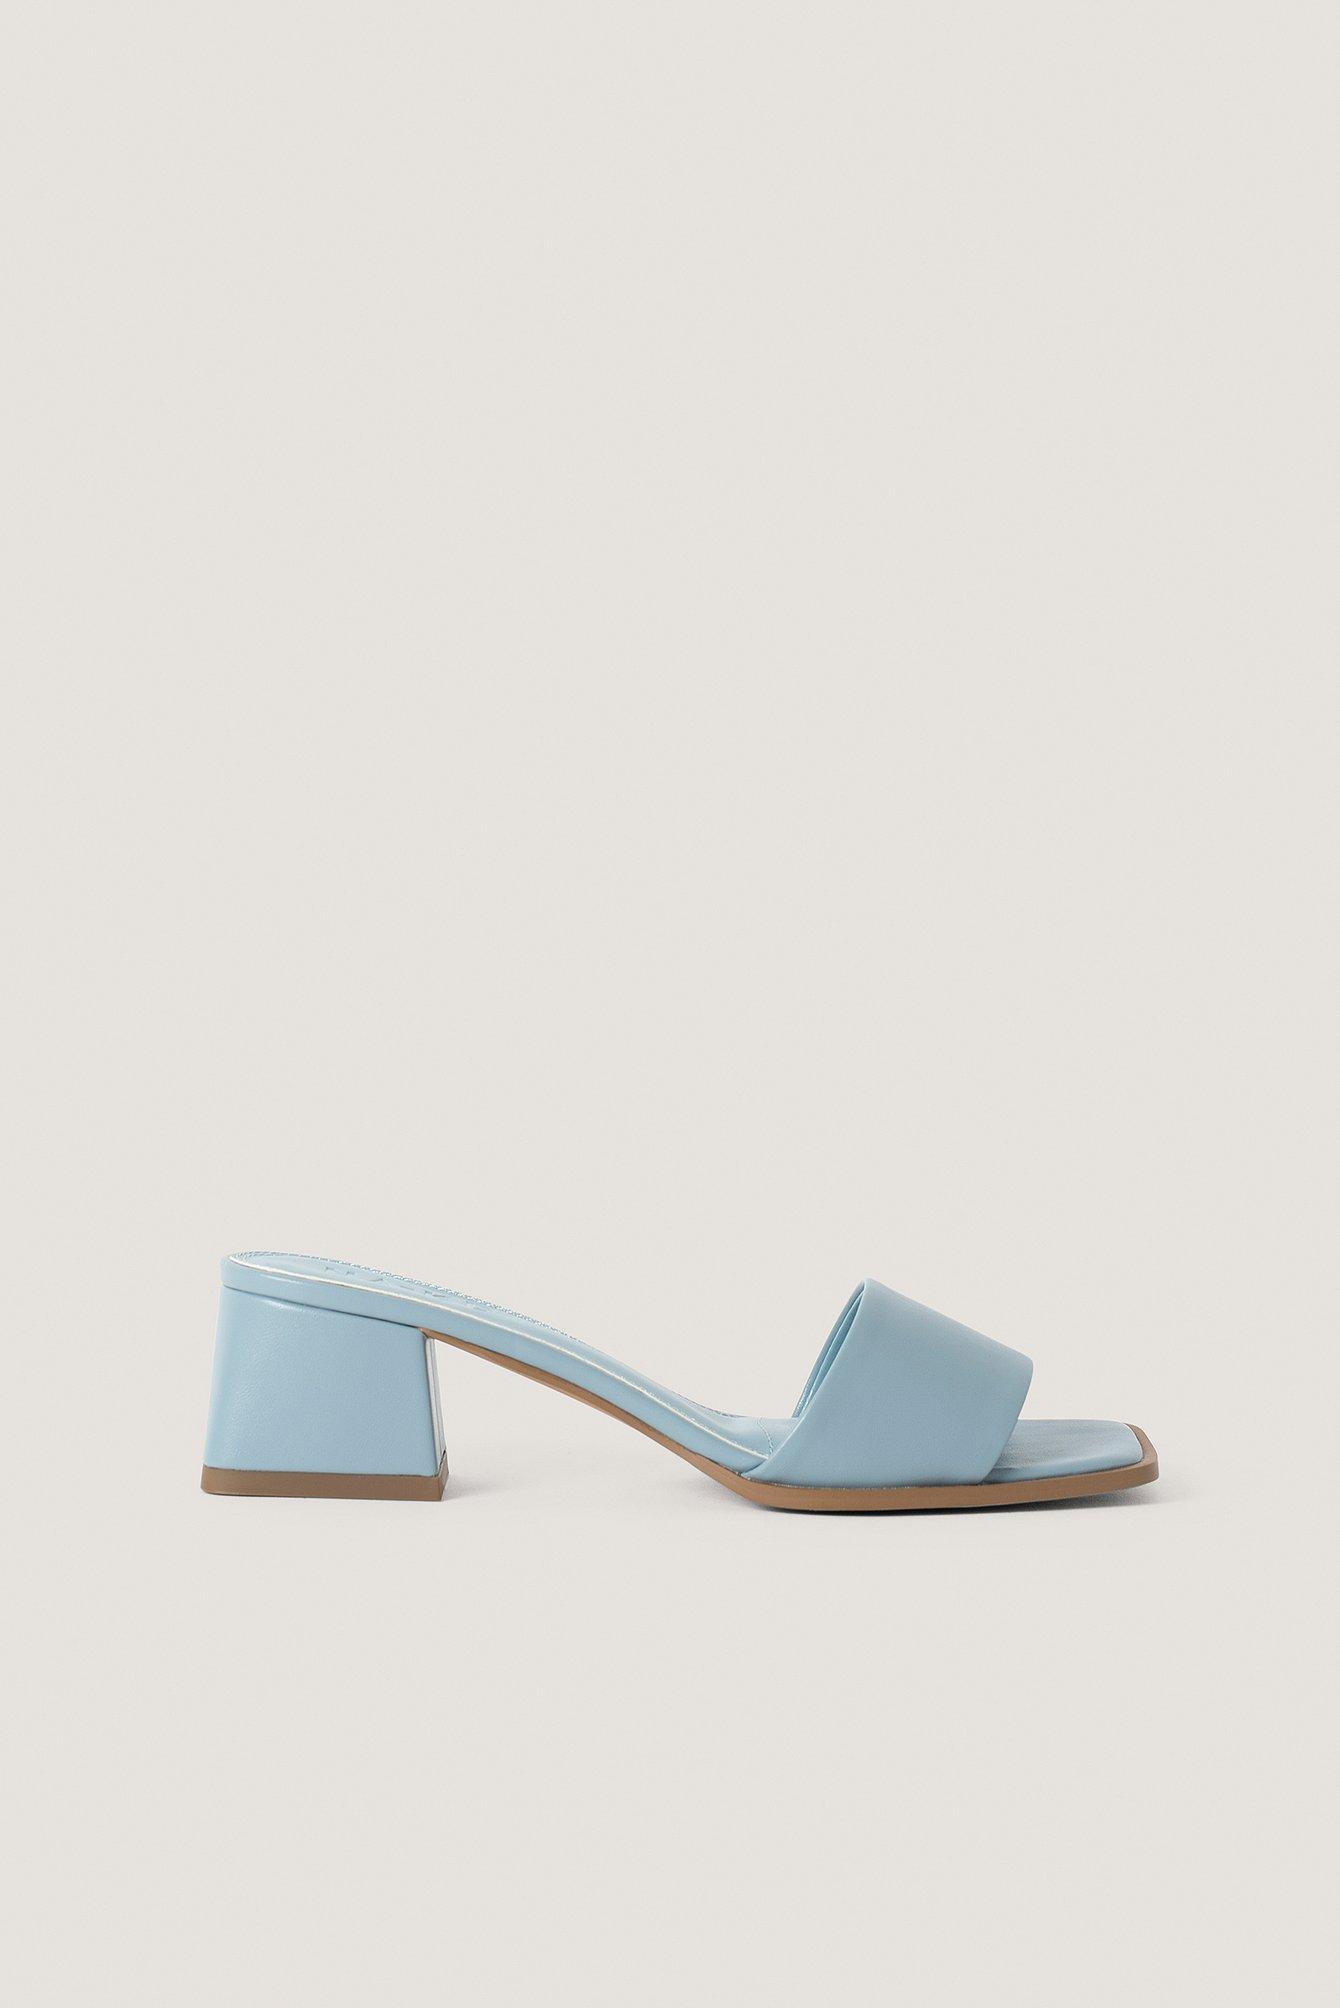 na-kd shoes -  Basic Block Heeled Mules - Blue